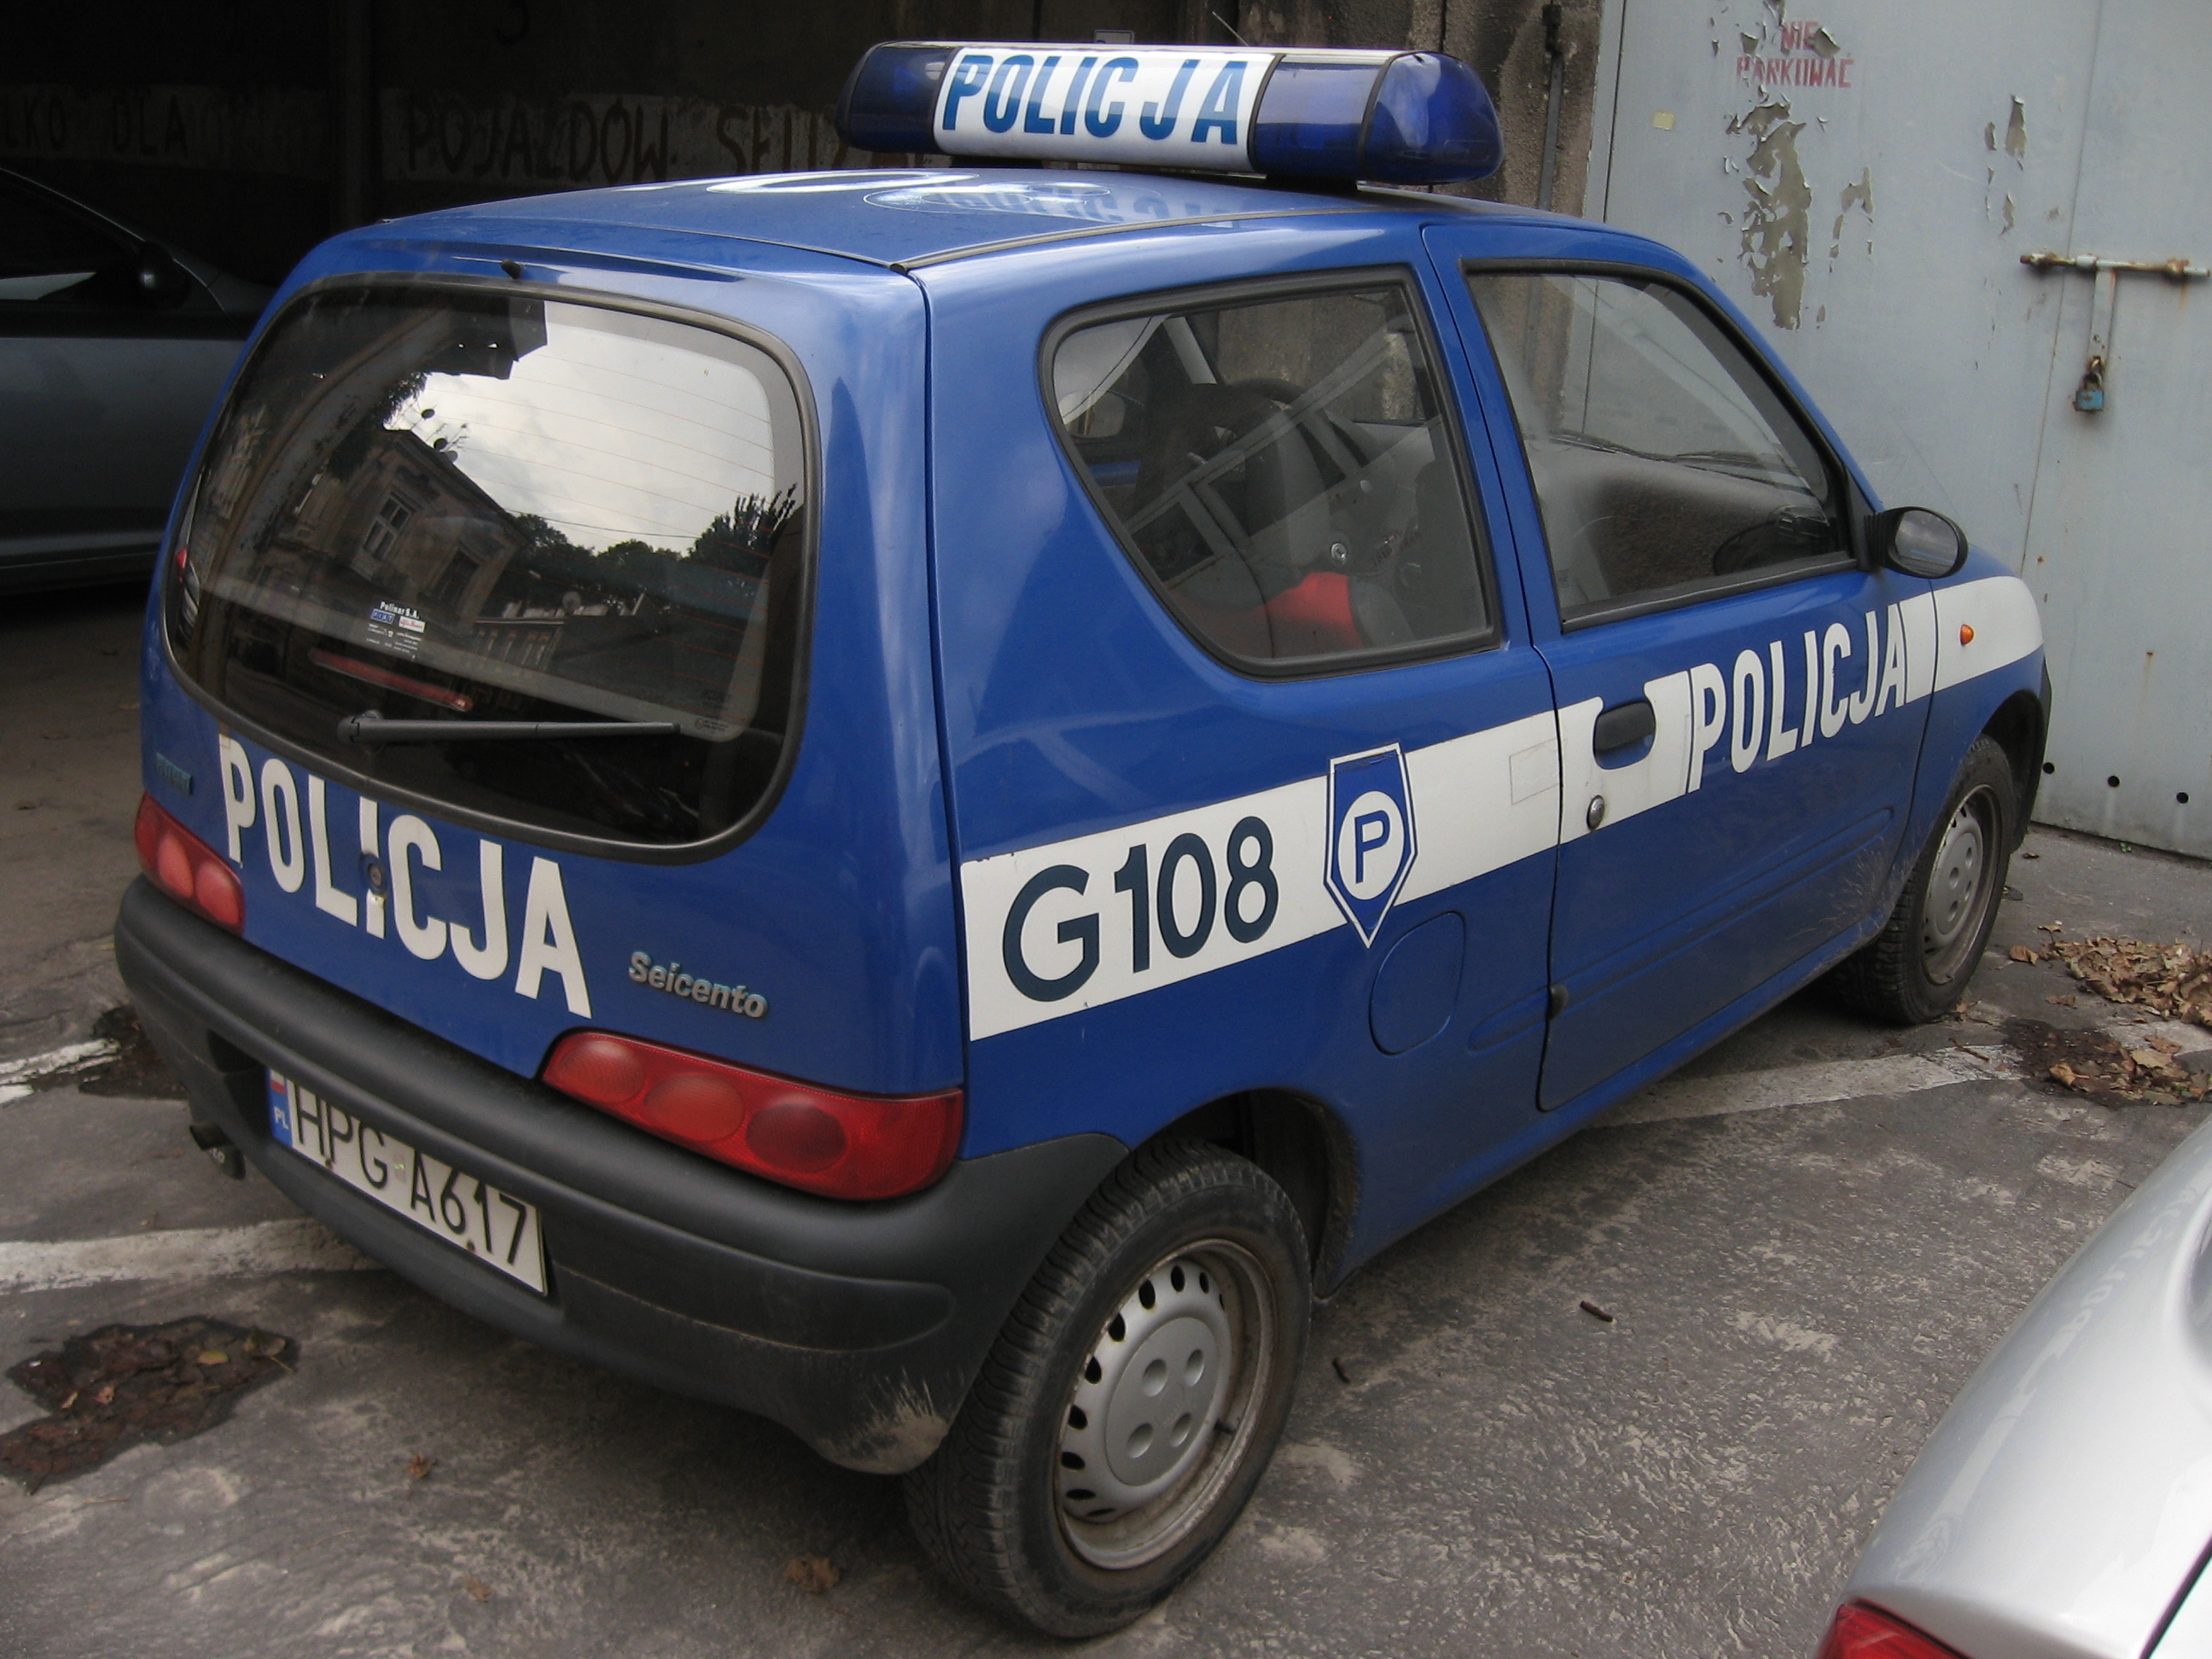 File:Fiat Seicento of Policja in Kraków.jpg